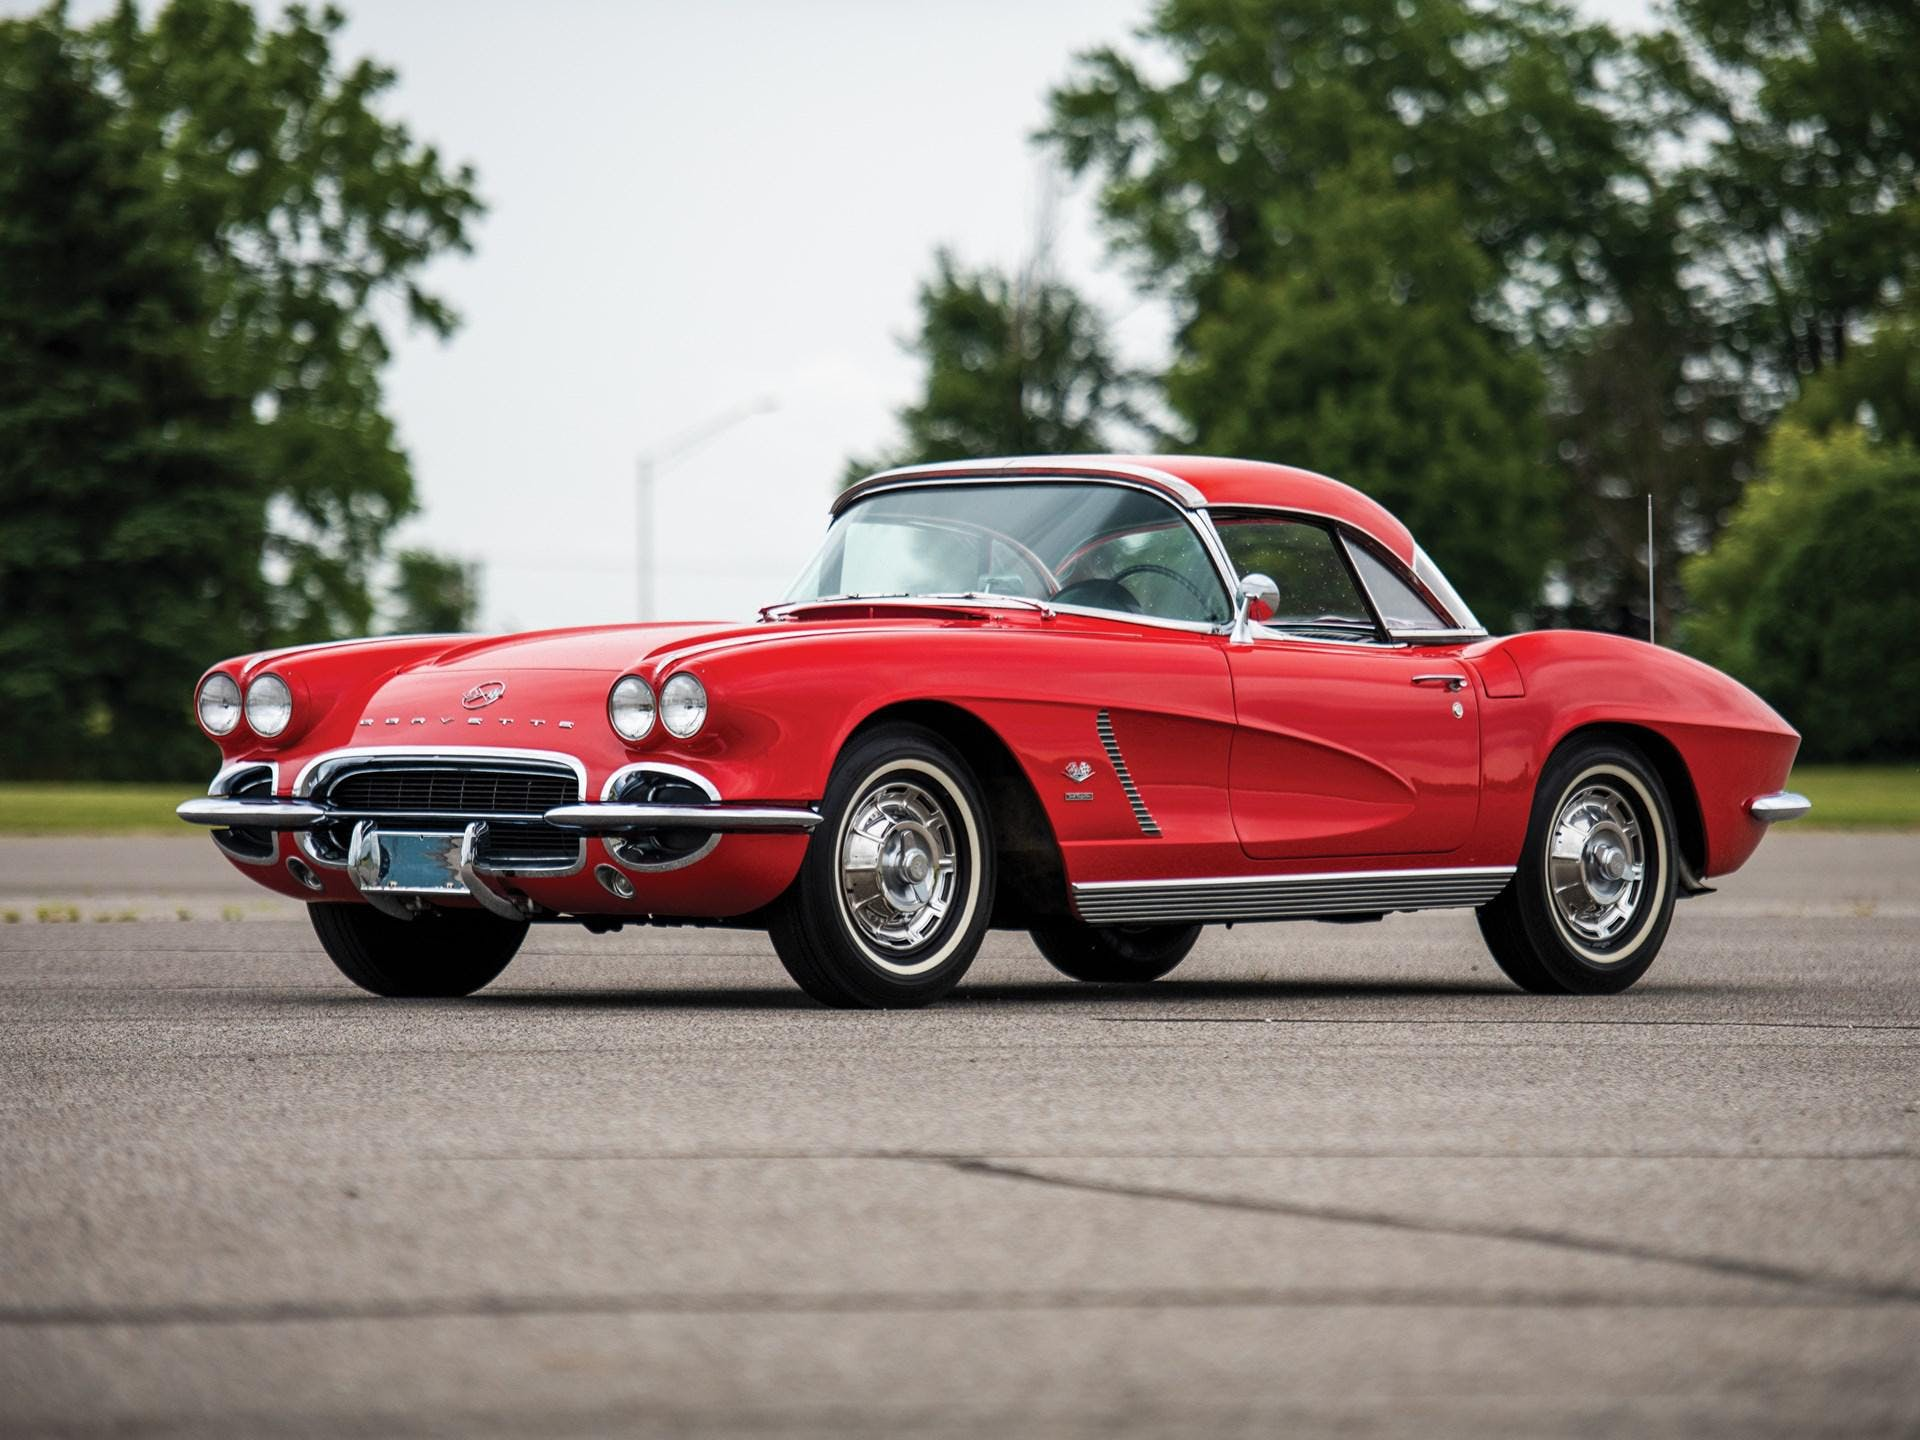 1962 Chevrolet Corvette 'Fuel-Injected'